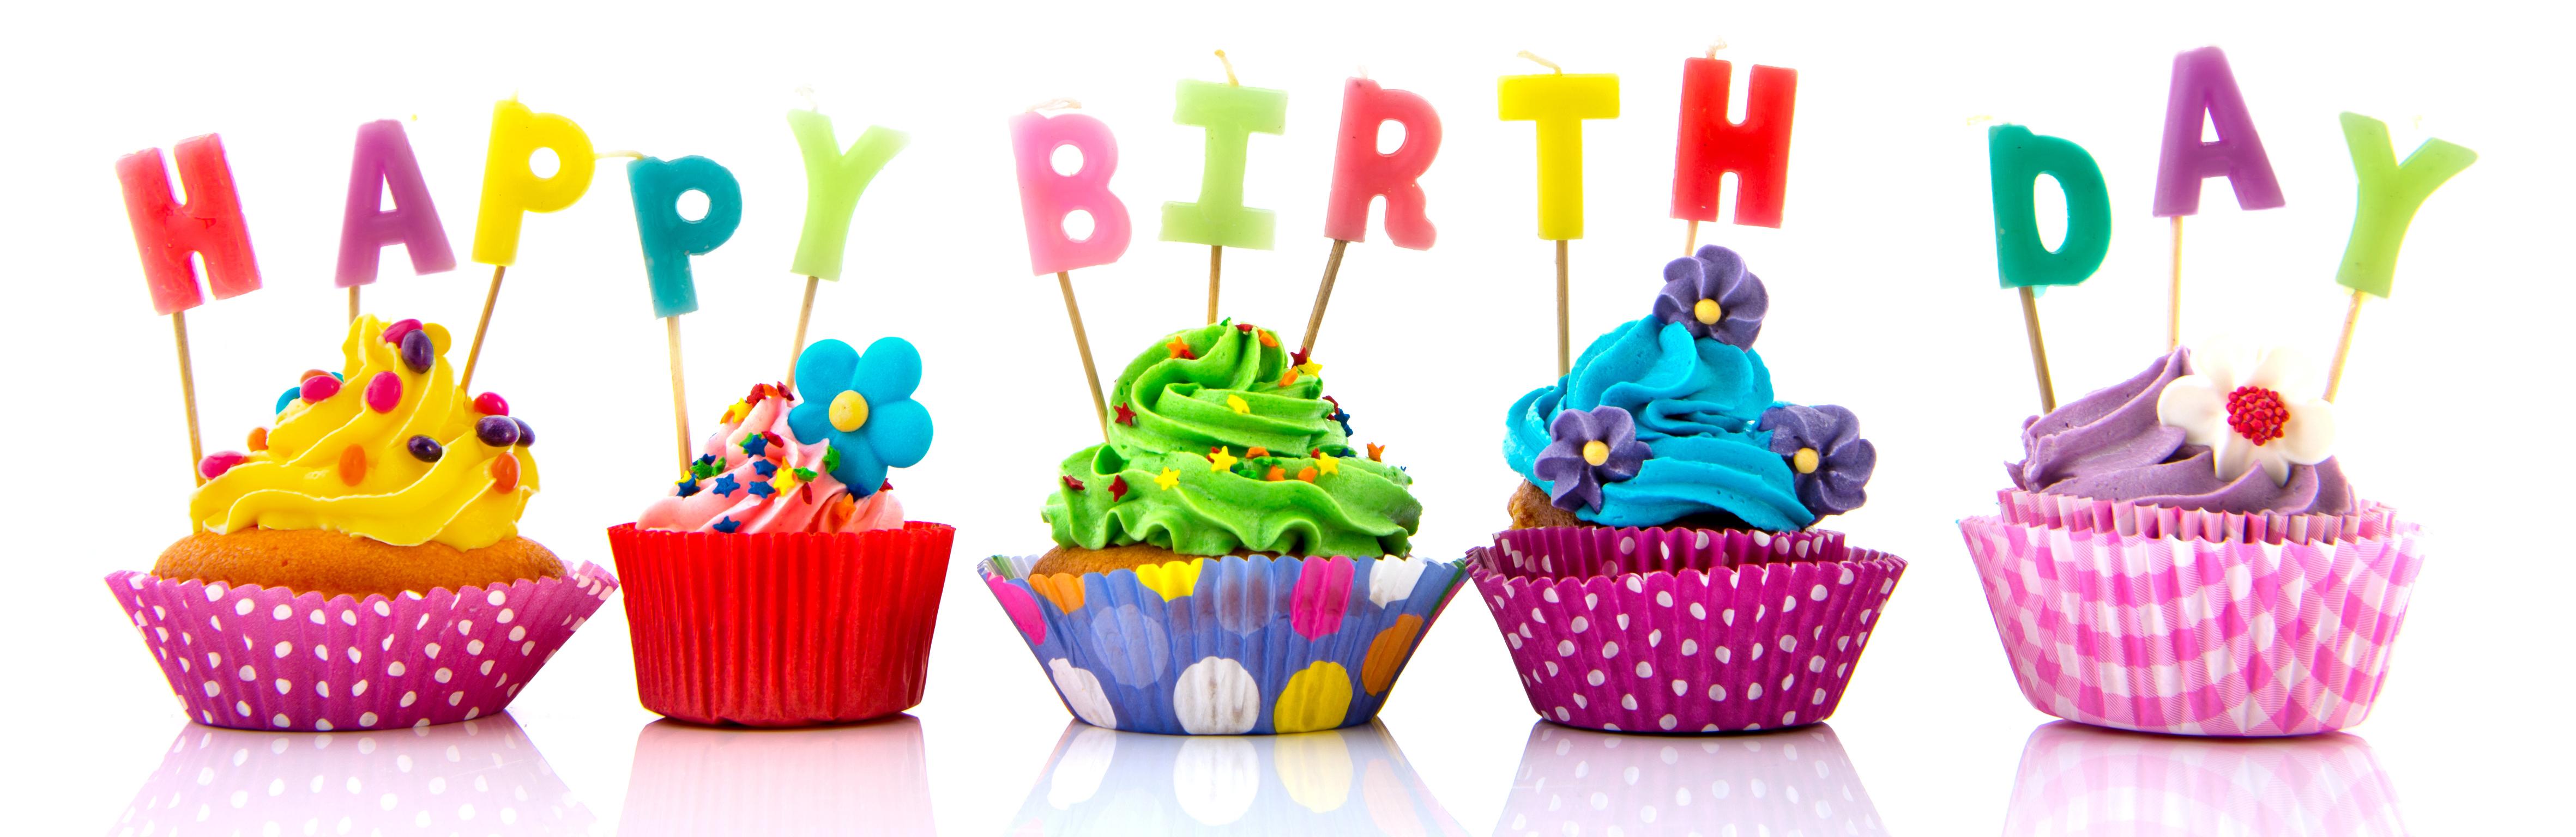 Happy_birthday-9